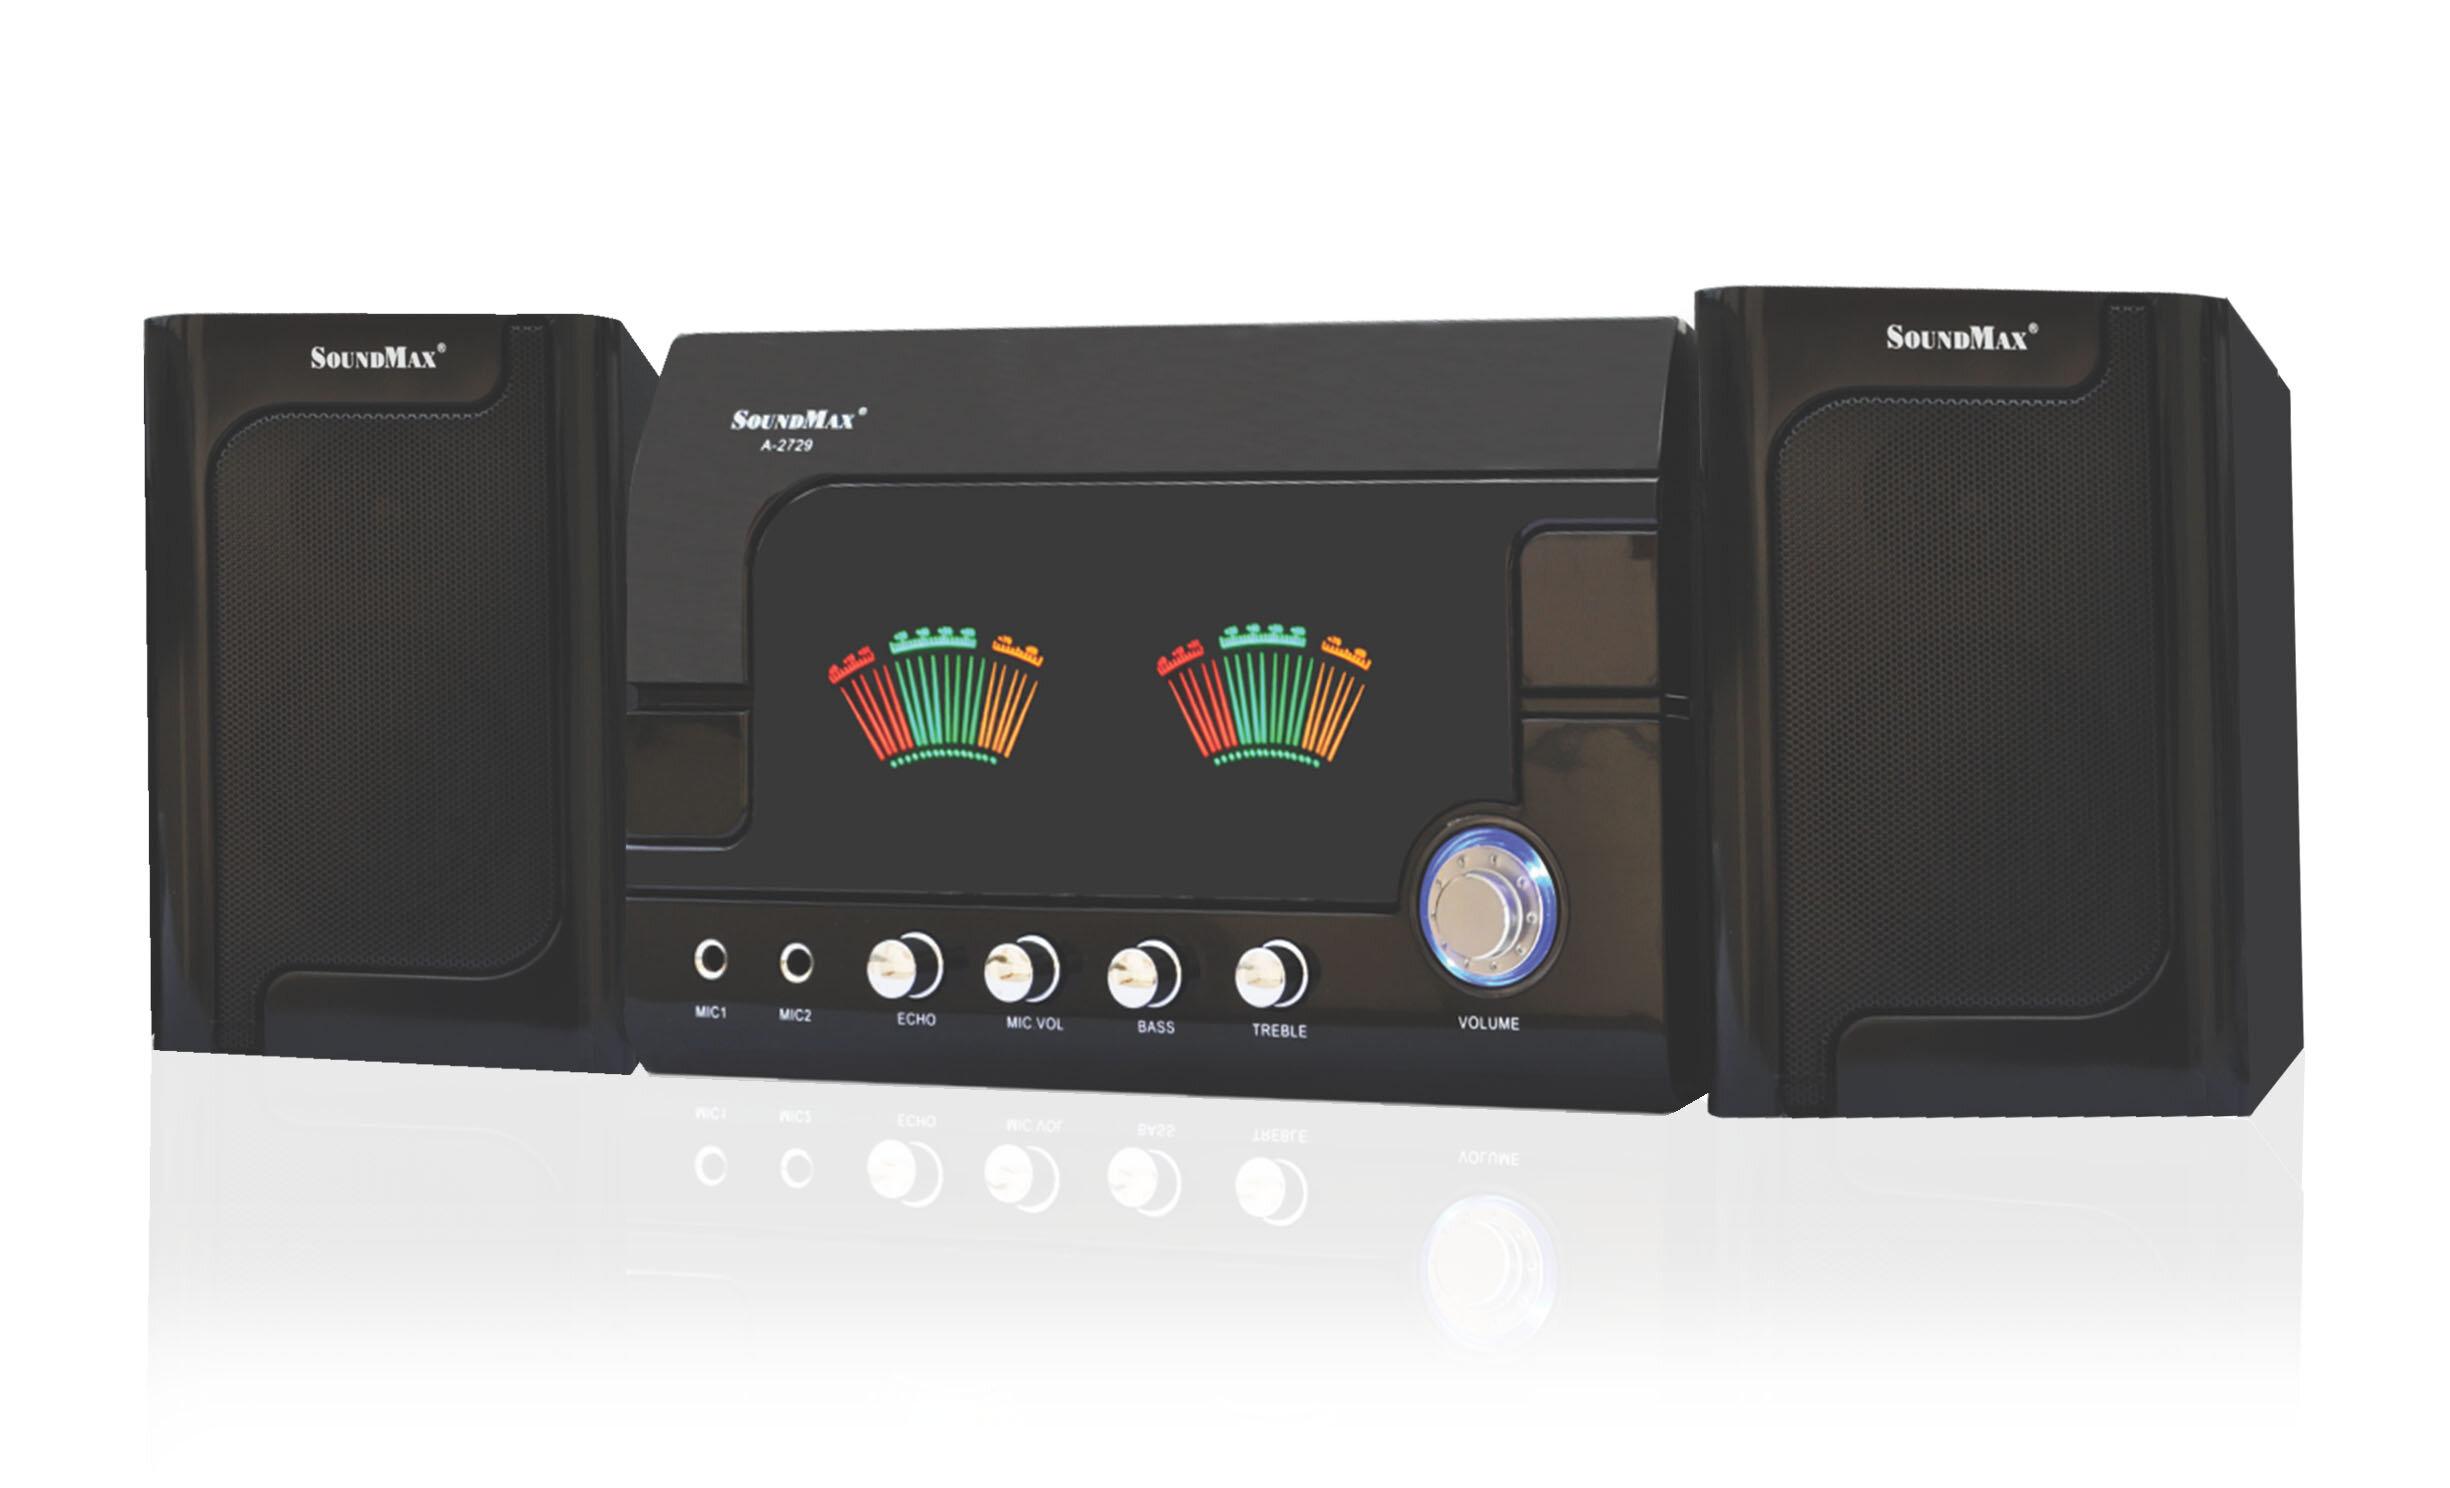 Loa vi tính SoundMax A2729